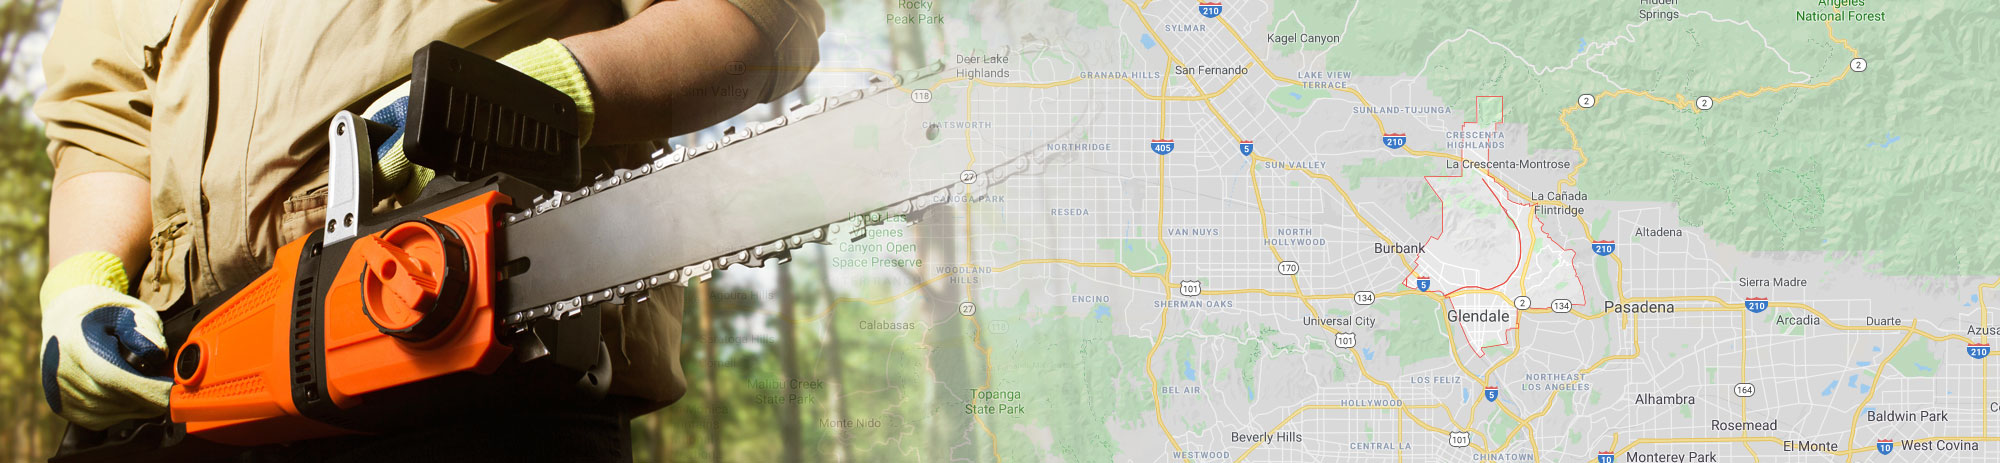 tree service Glendale, California